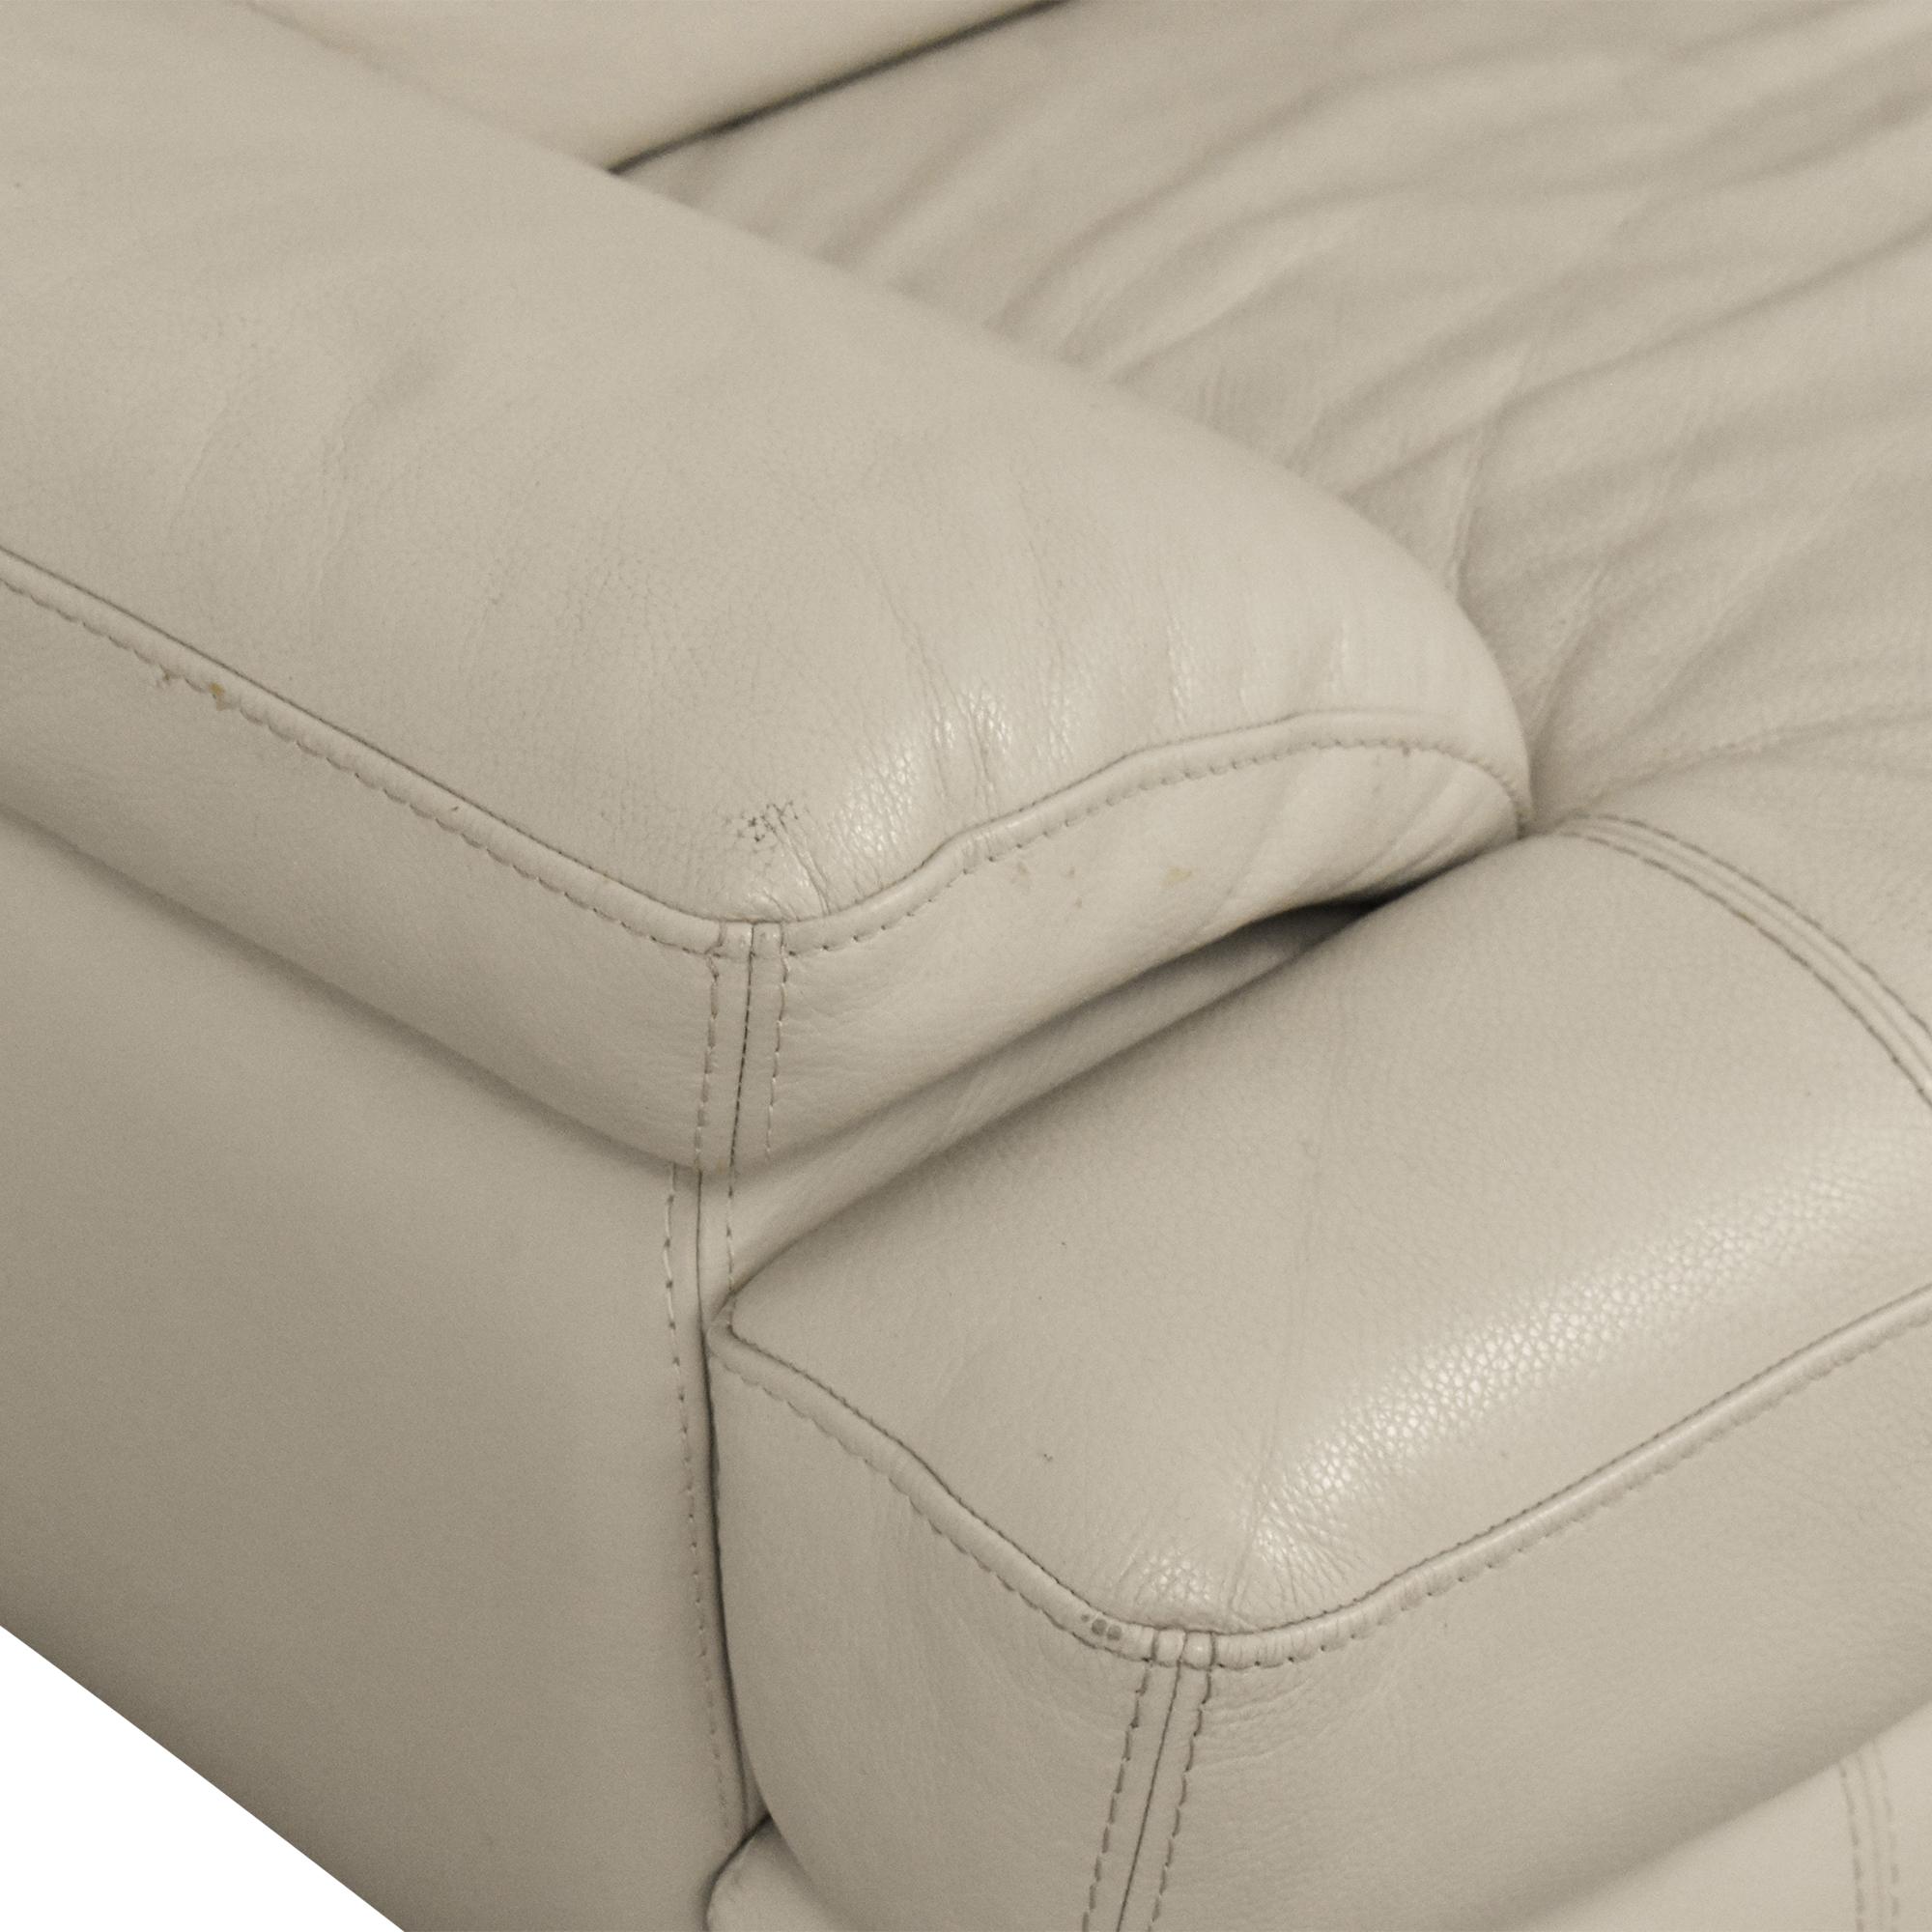 Chateau d'Ax Lounge Chair / Chairs